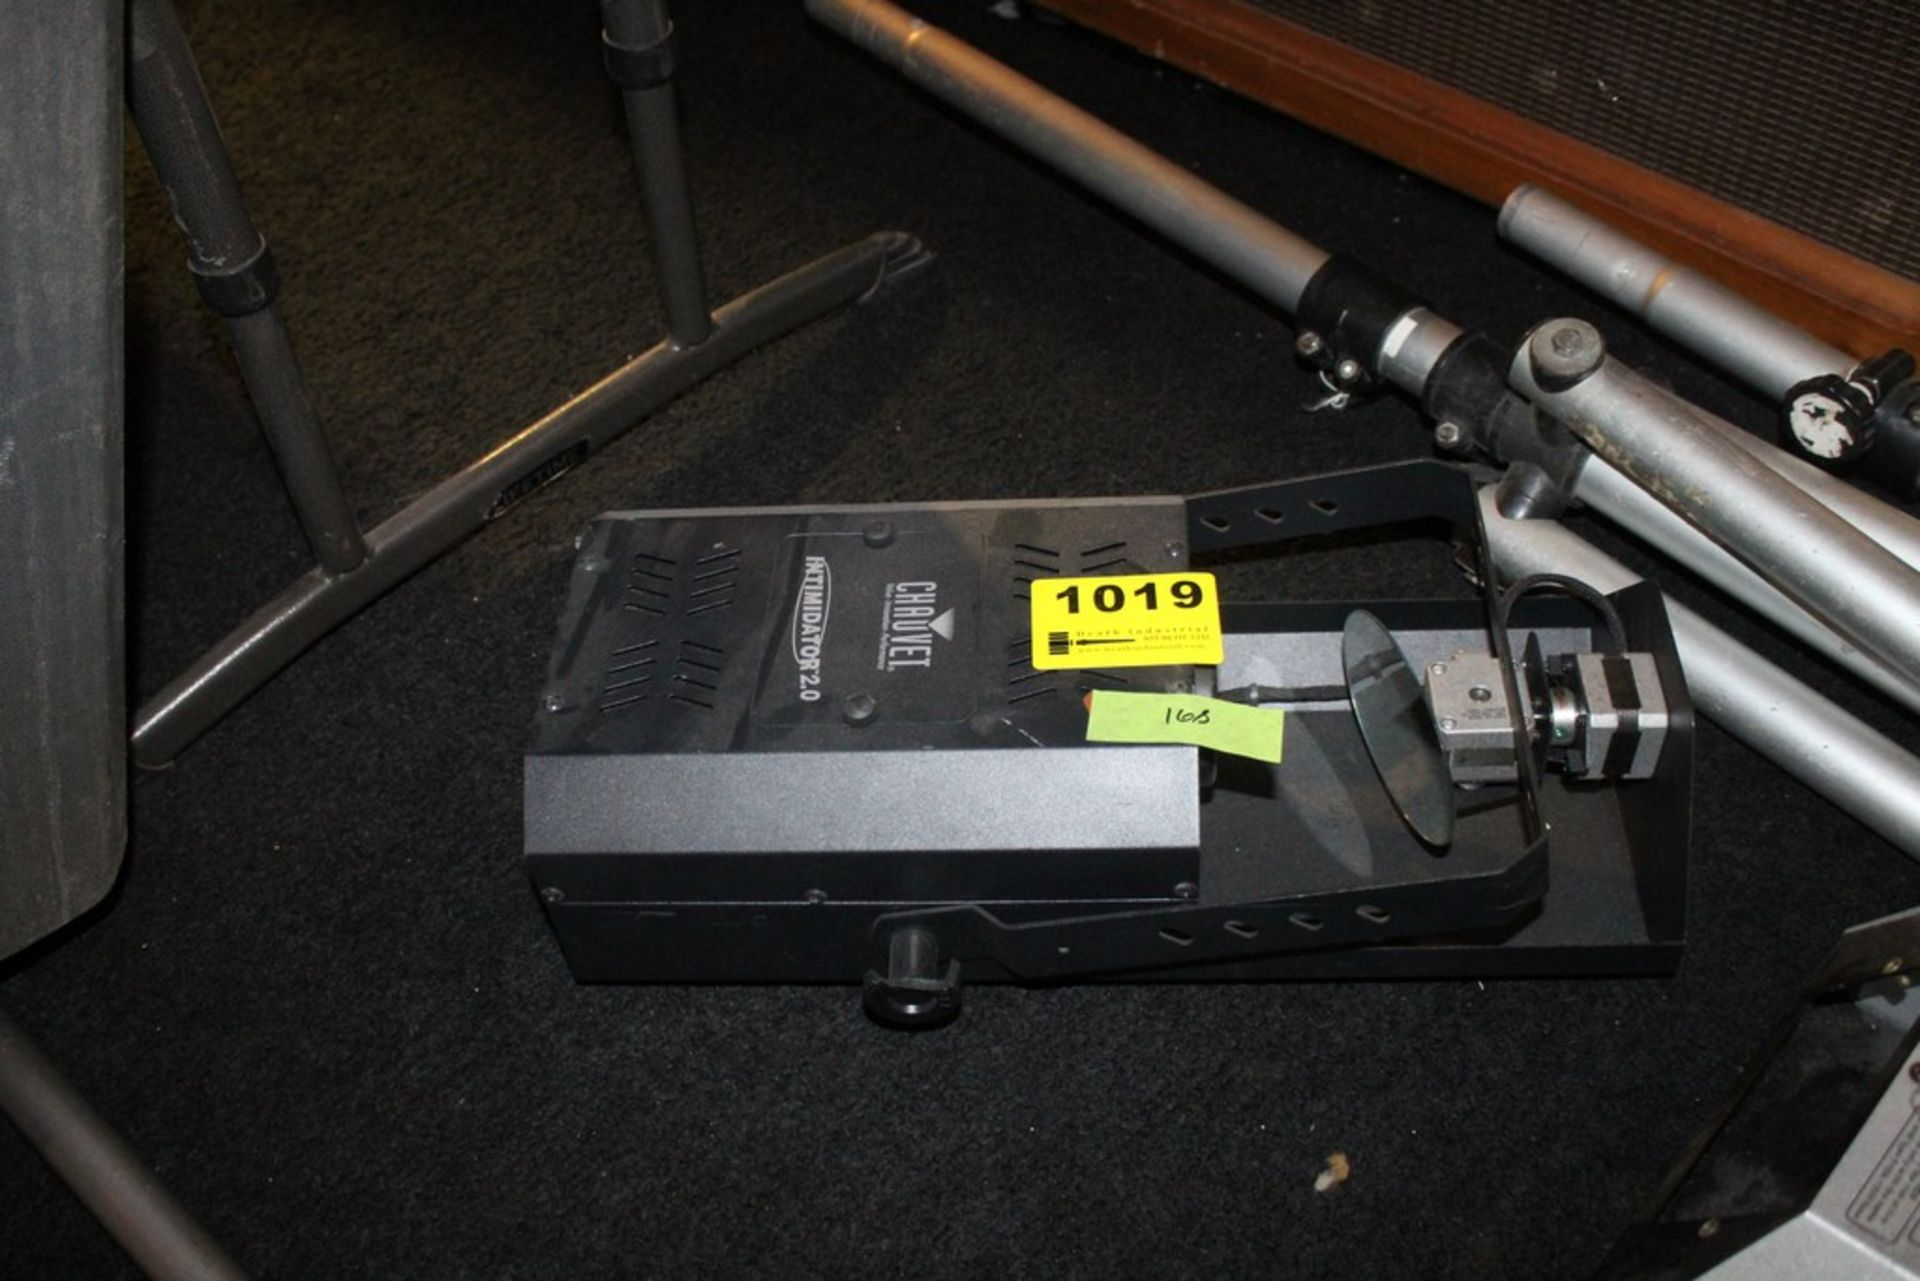 Lot 1019 - CHAUVET MODEL INTIMIDATOR 2.0 5 CHANNEL DMX INTELLIGENT SCANNER